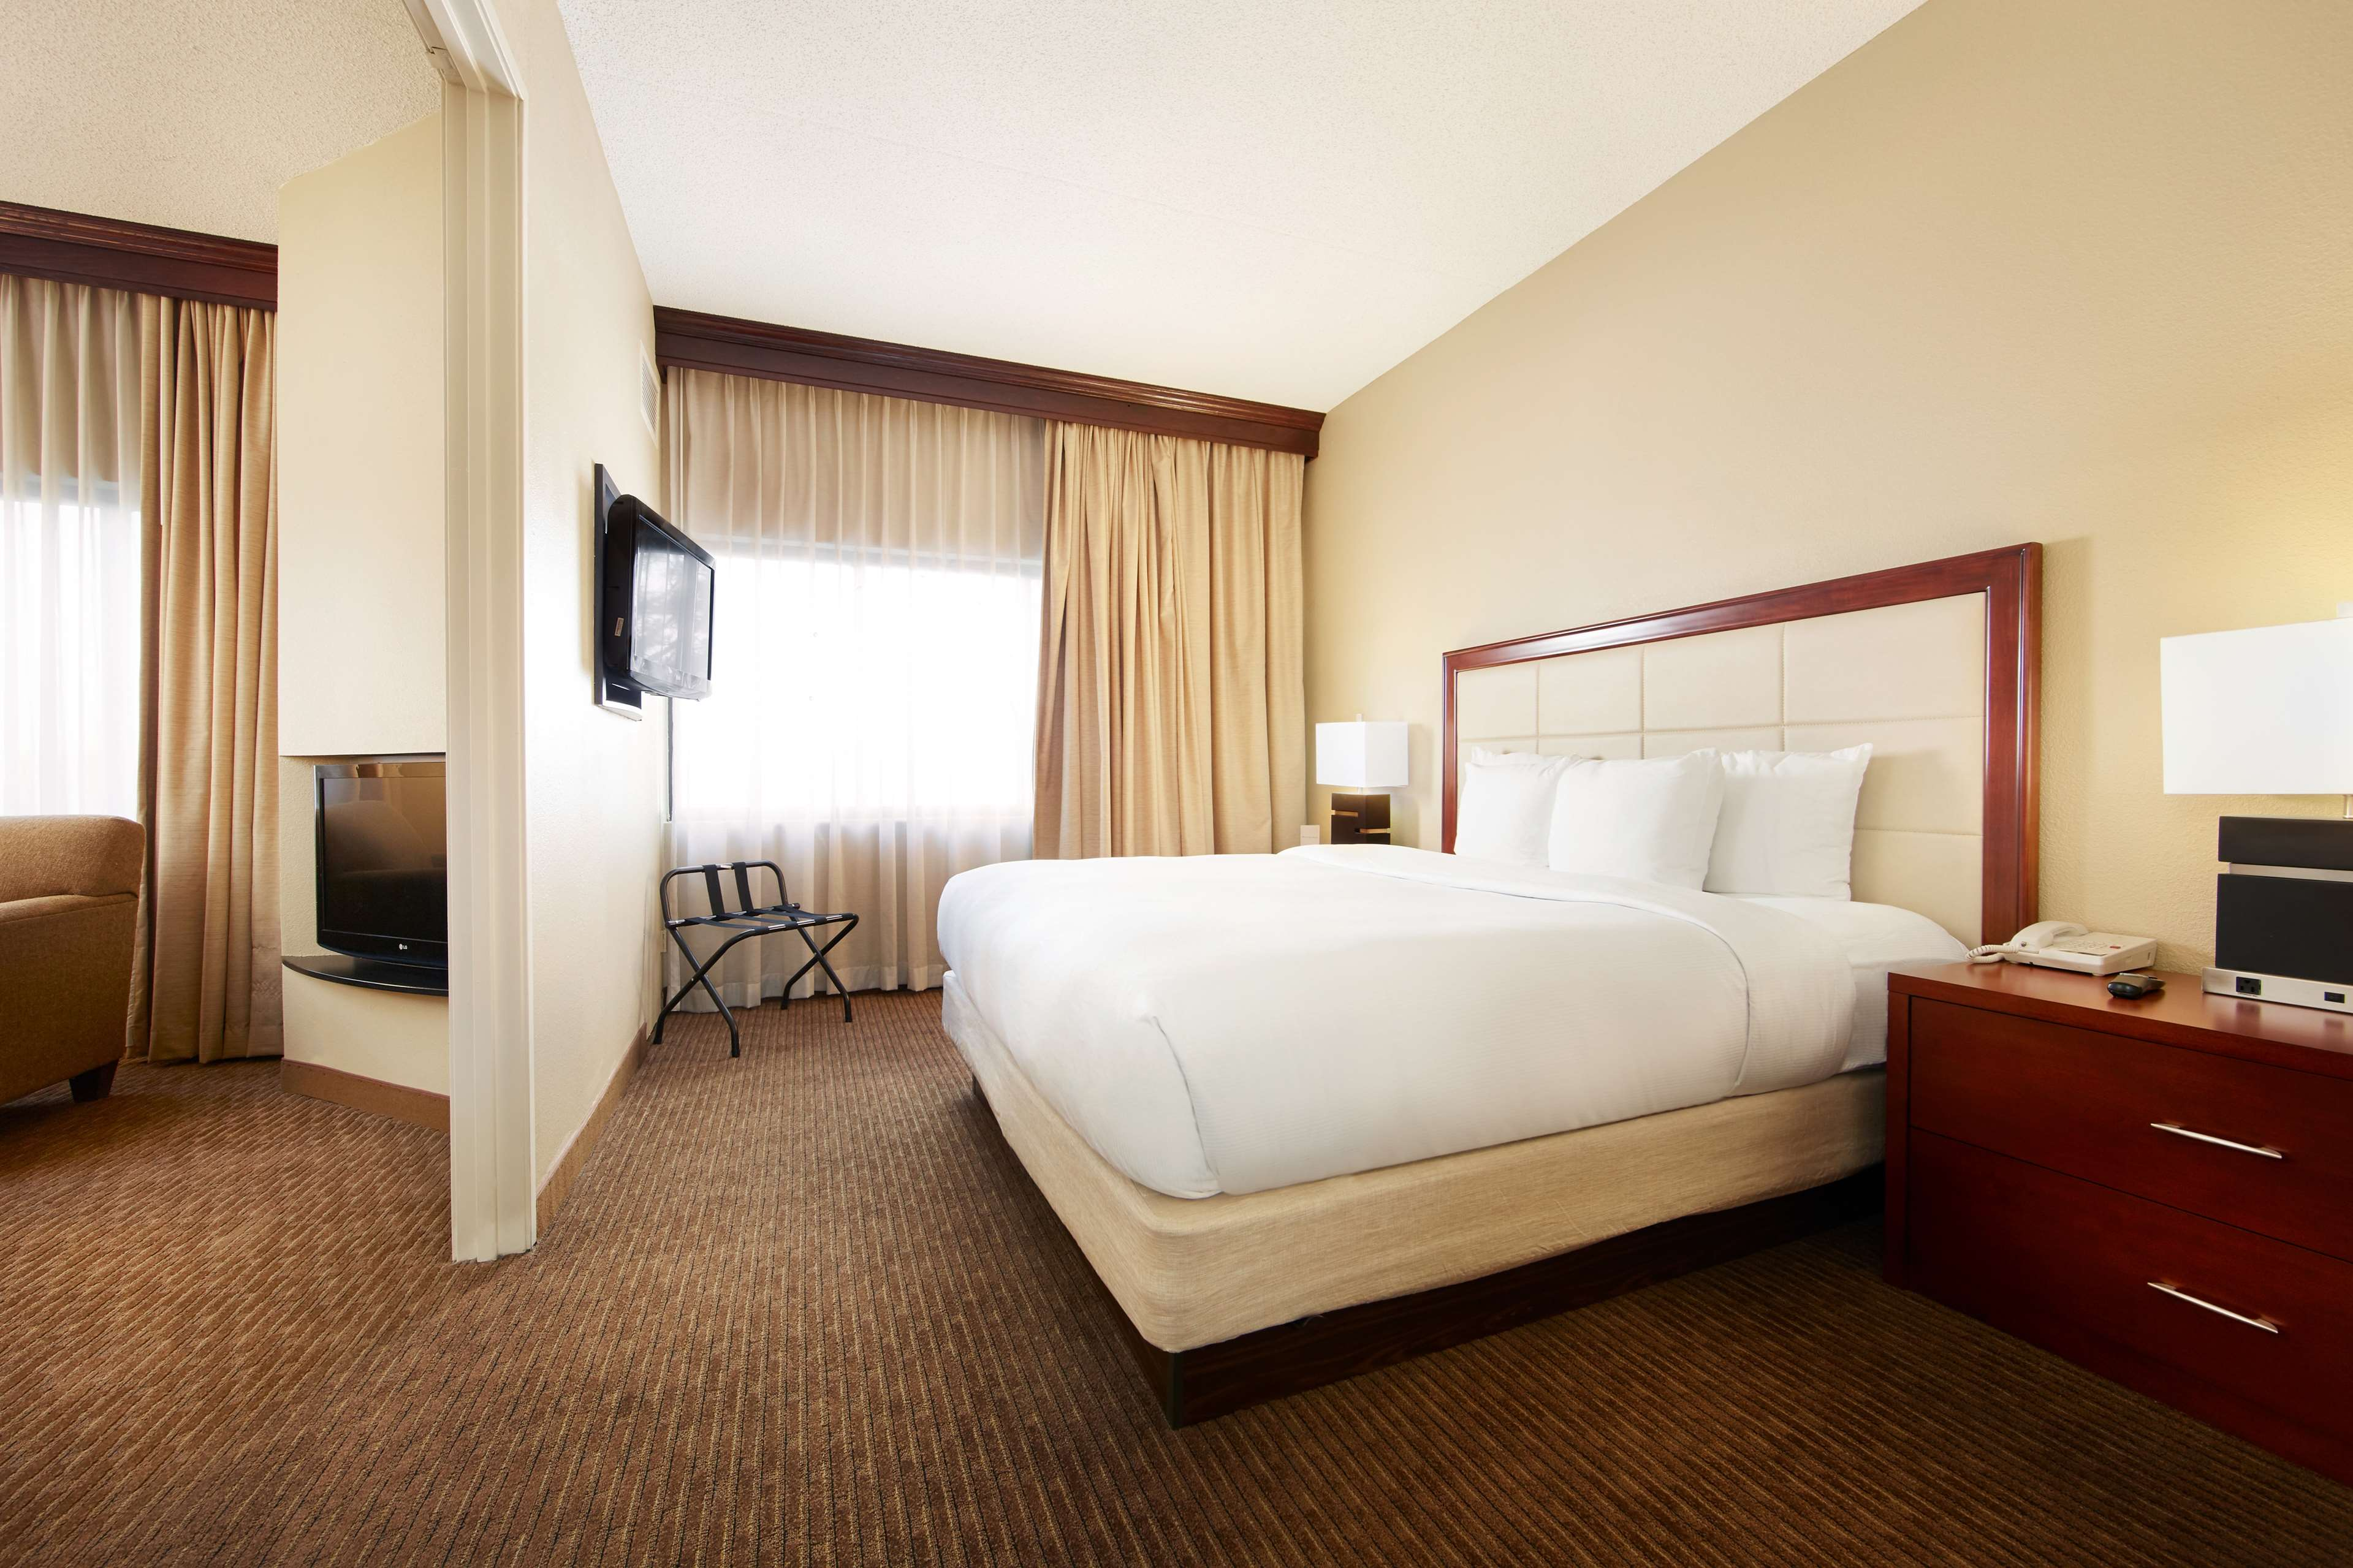 DoubleTree Suites by Hilton Hotel Cincinnati - Blue Ash image 25